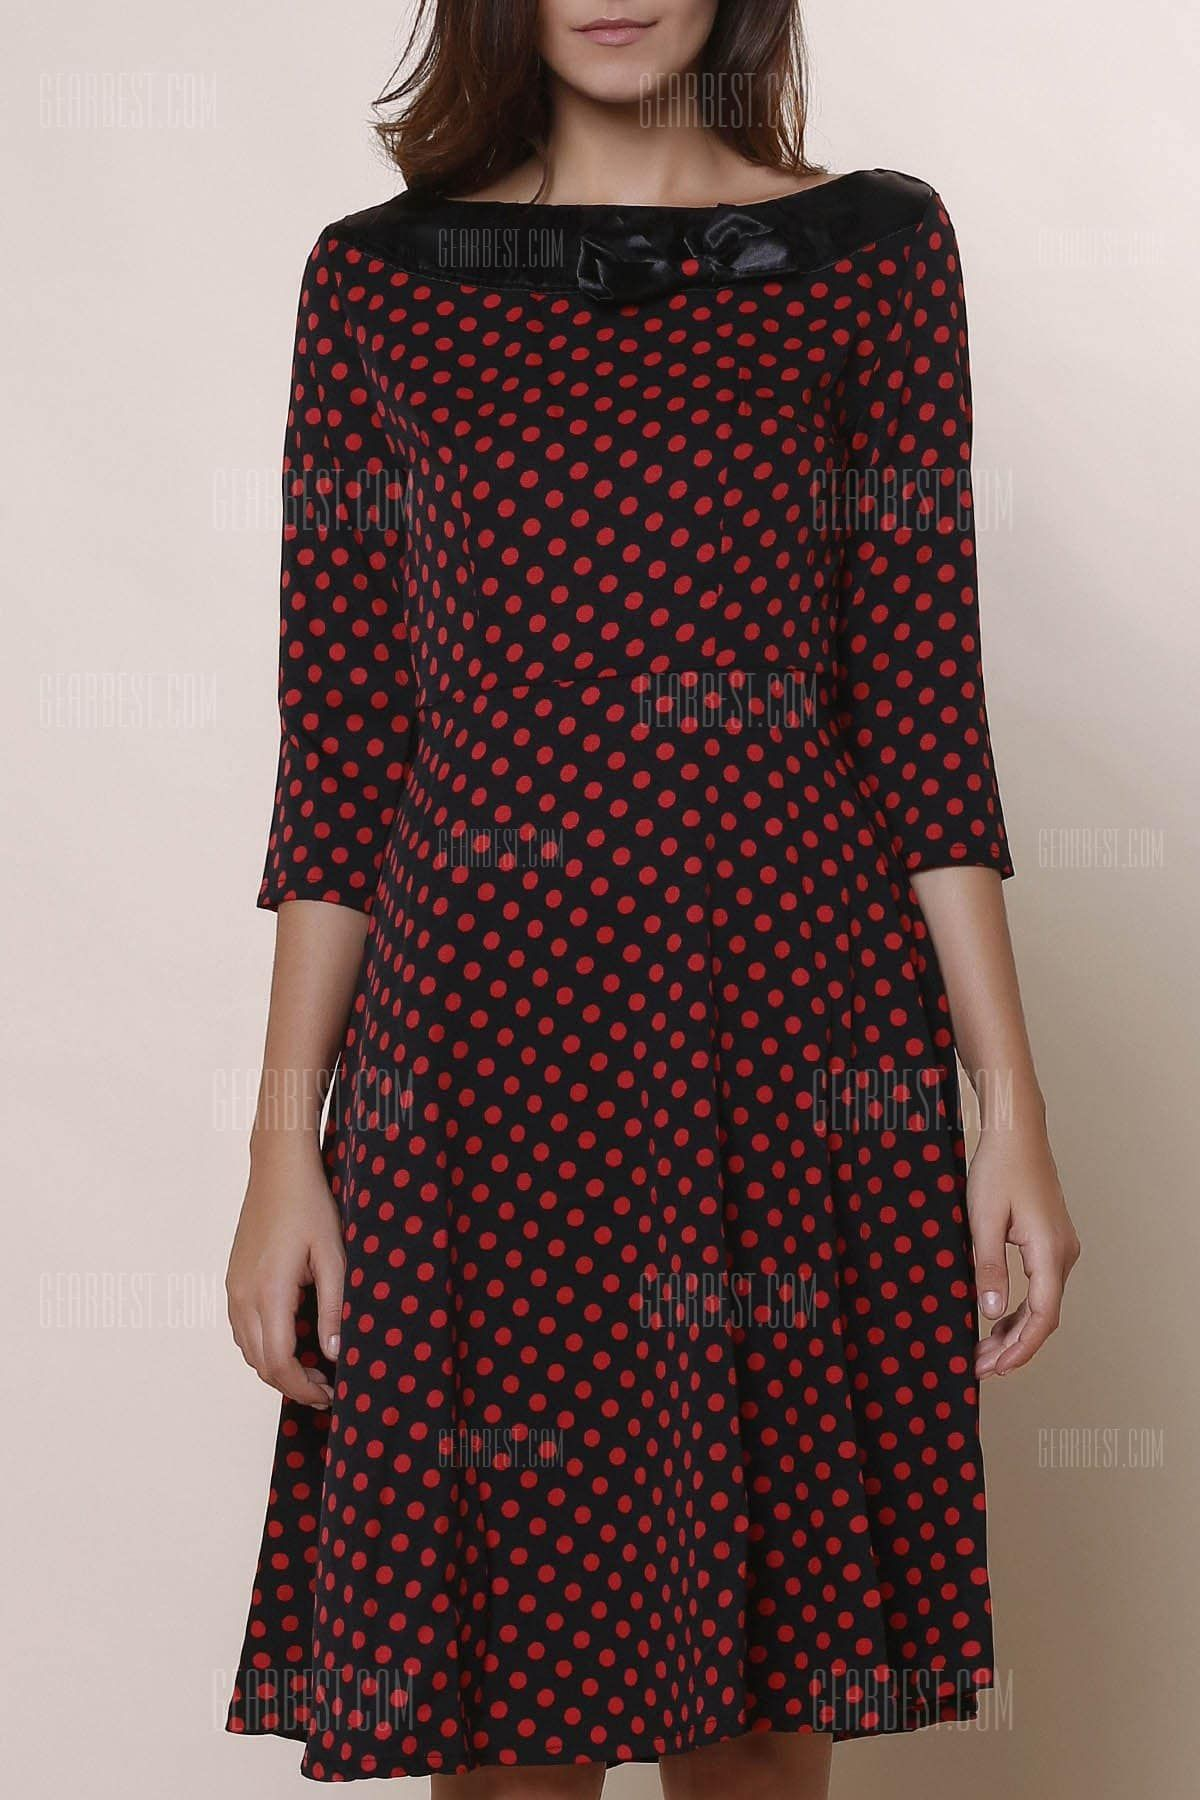 Vintage slash neck polka dot print bowknot design sleeve dress